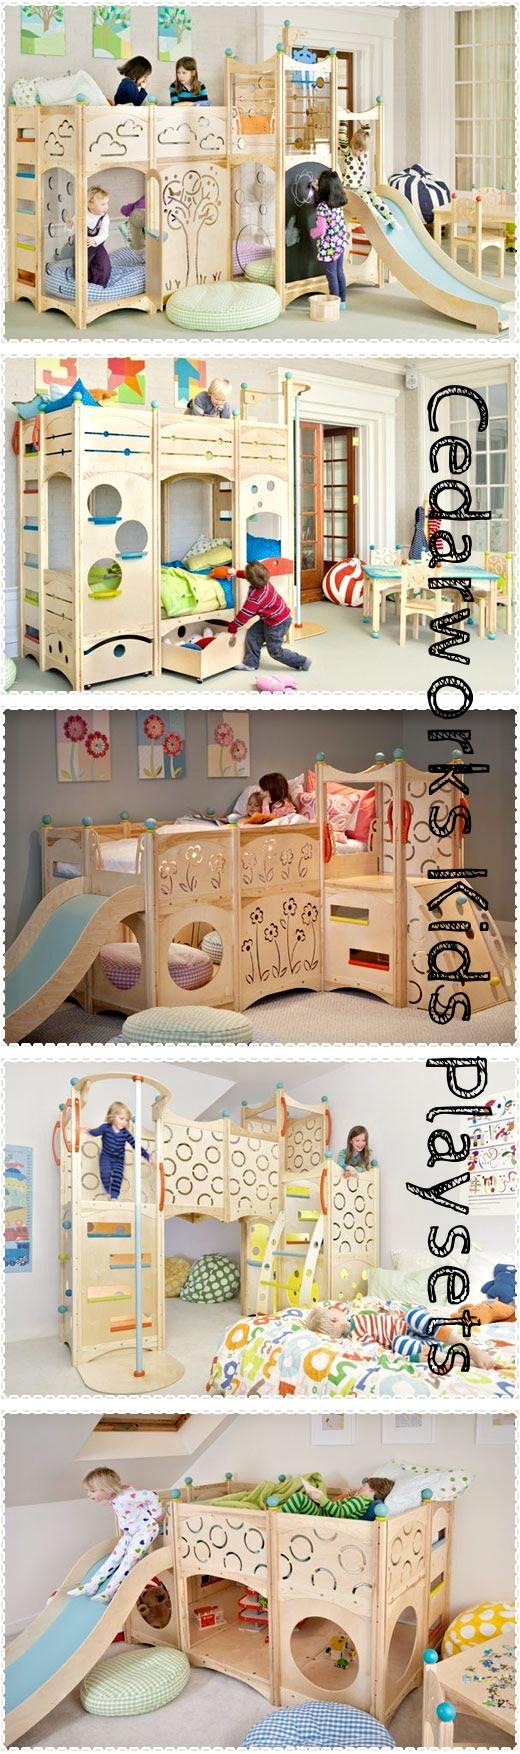 cedarworks-kids-playsets.jpg